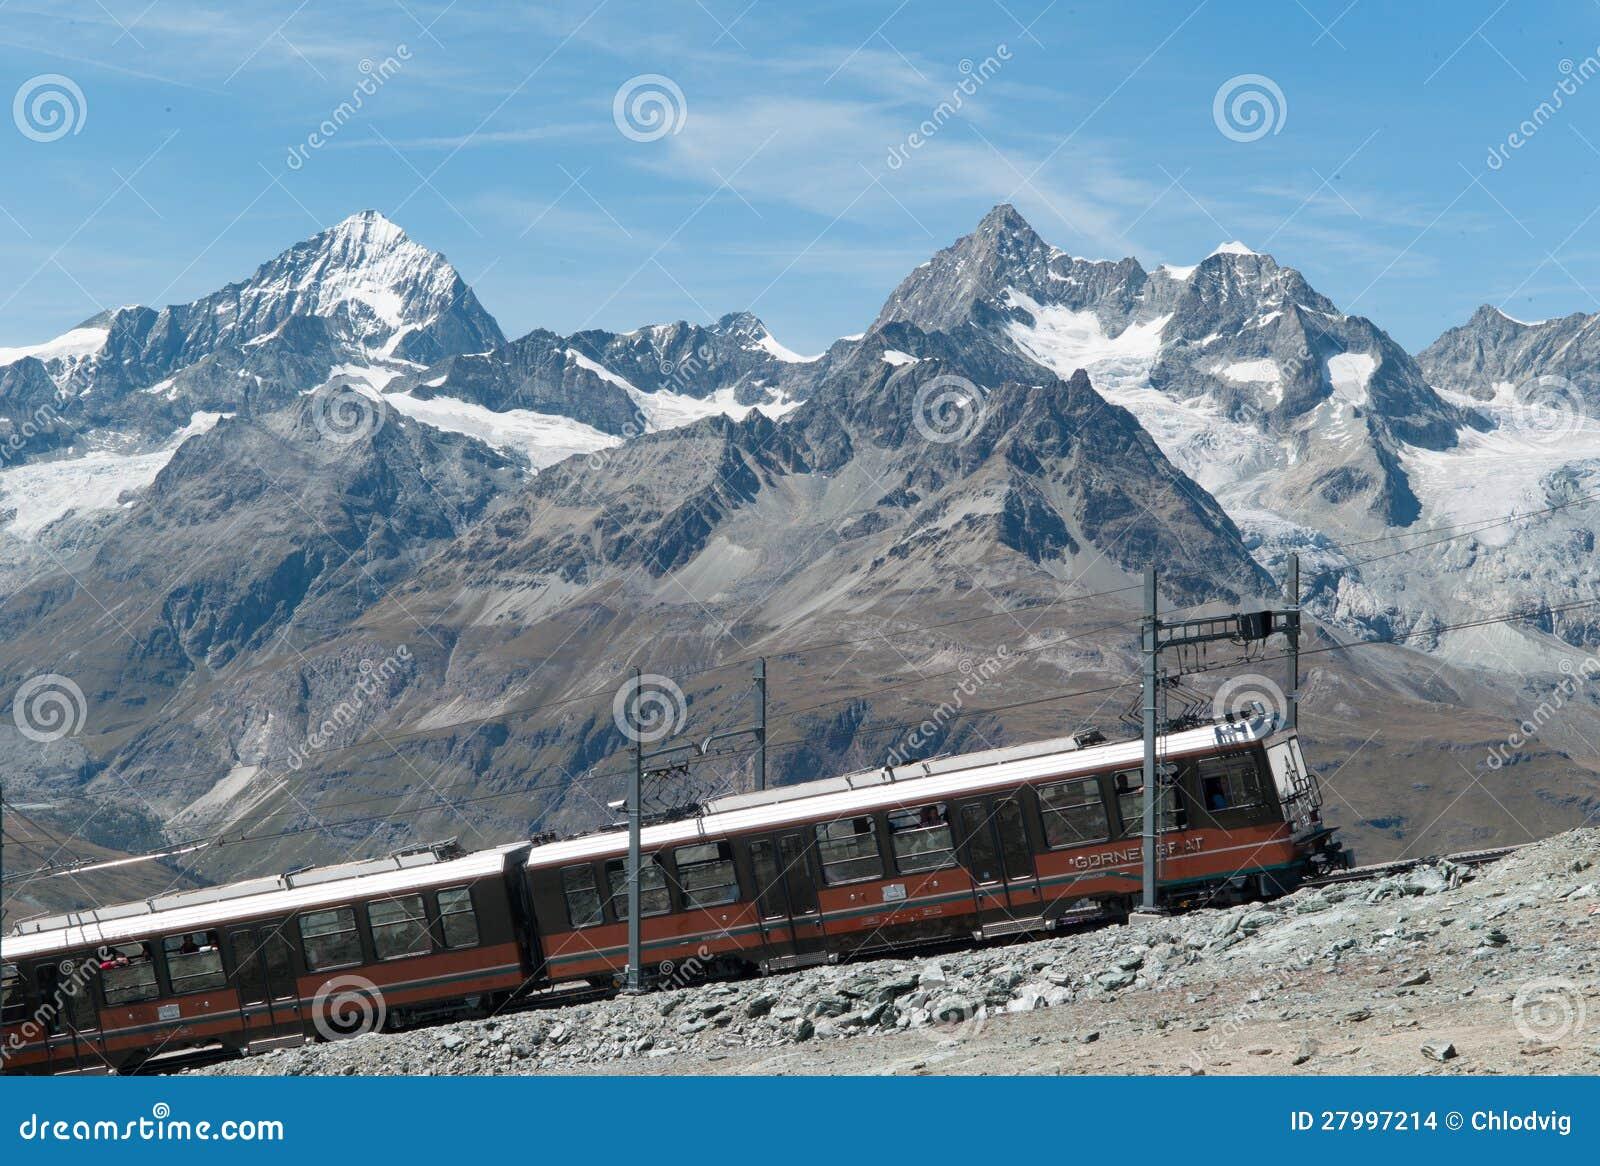 Train de Gornergrat sur la pente escarpée